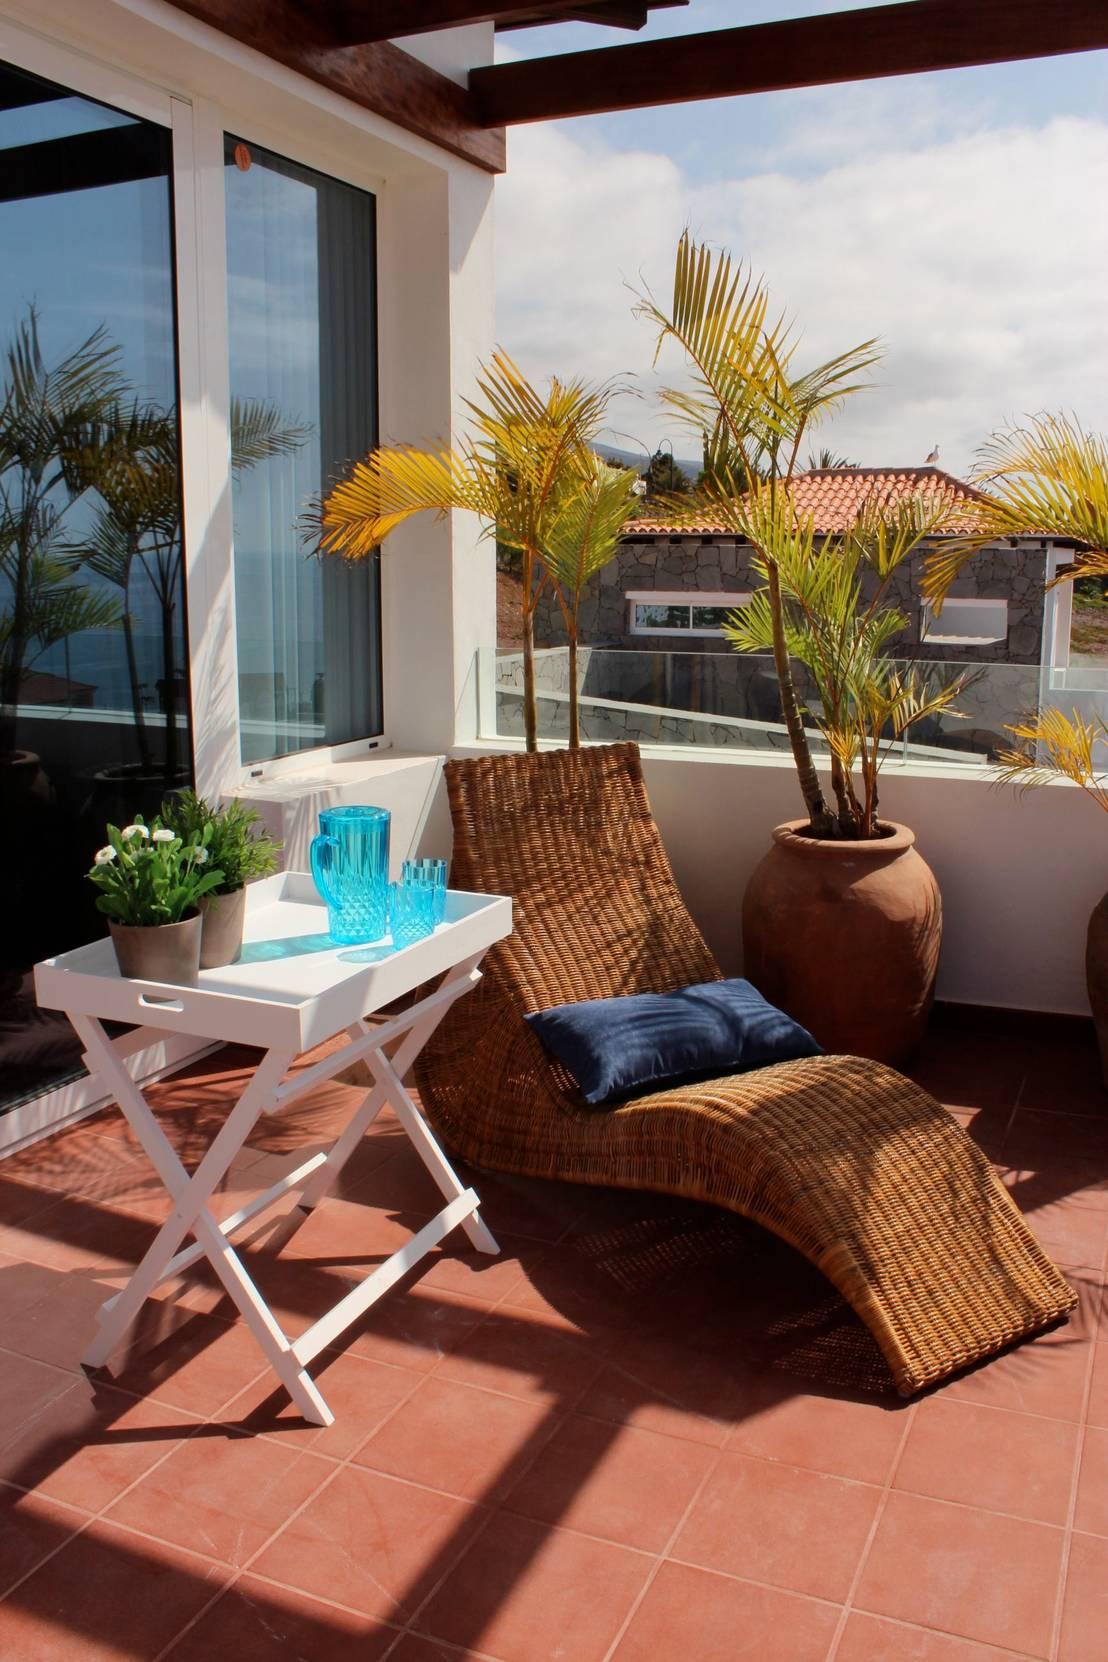 7 grandes ideas para balcones y terrazas peque as for Mobiliario para terrazas pequenas